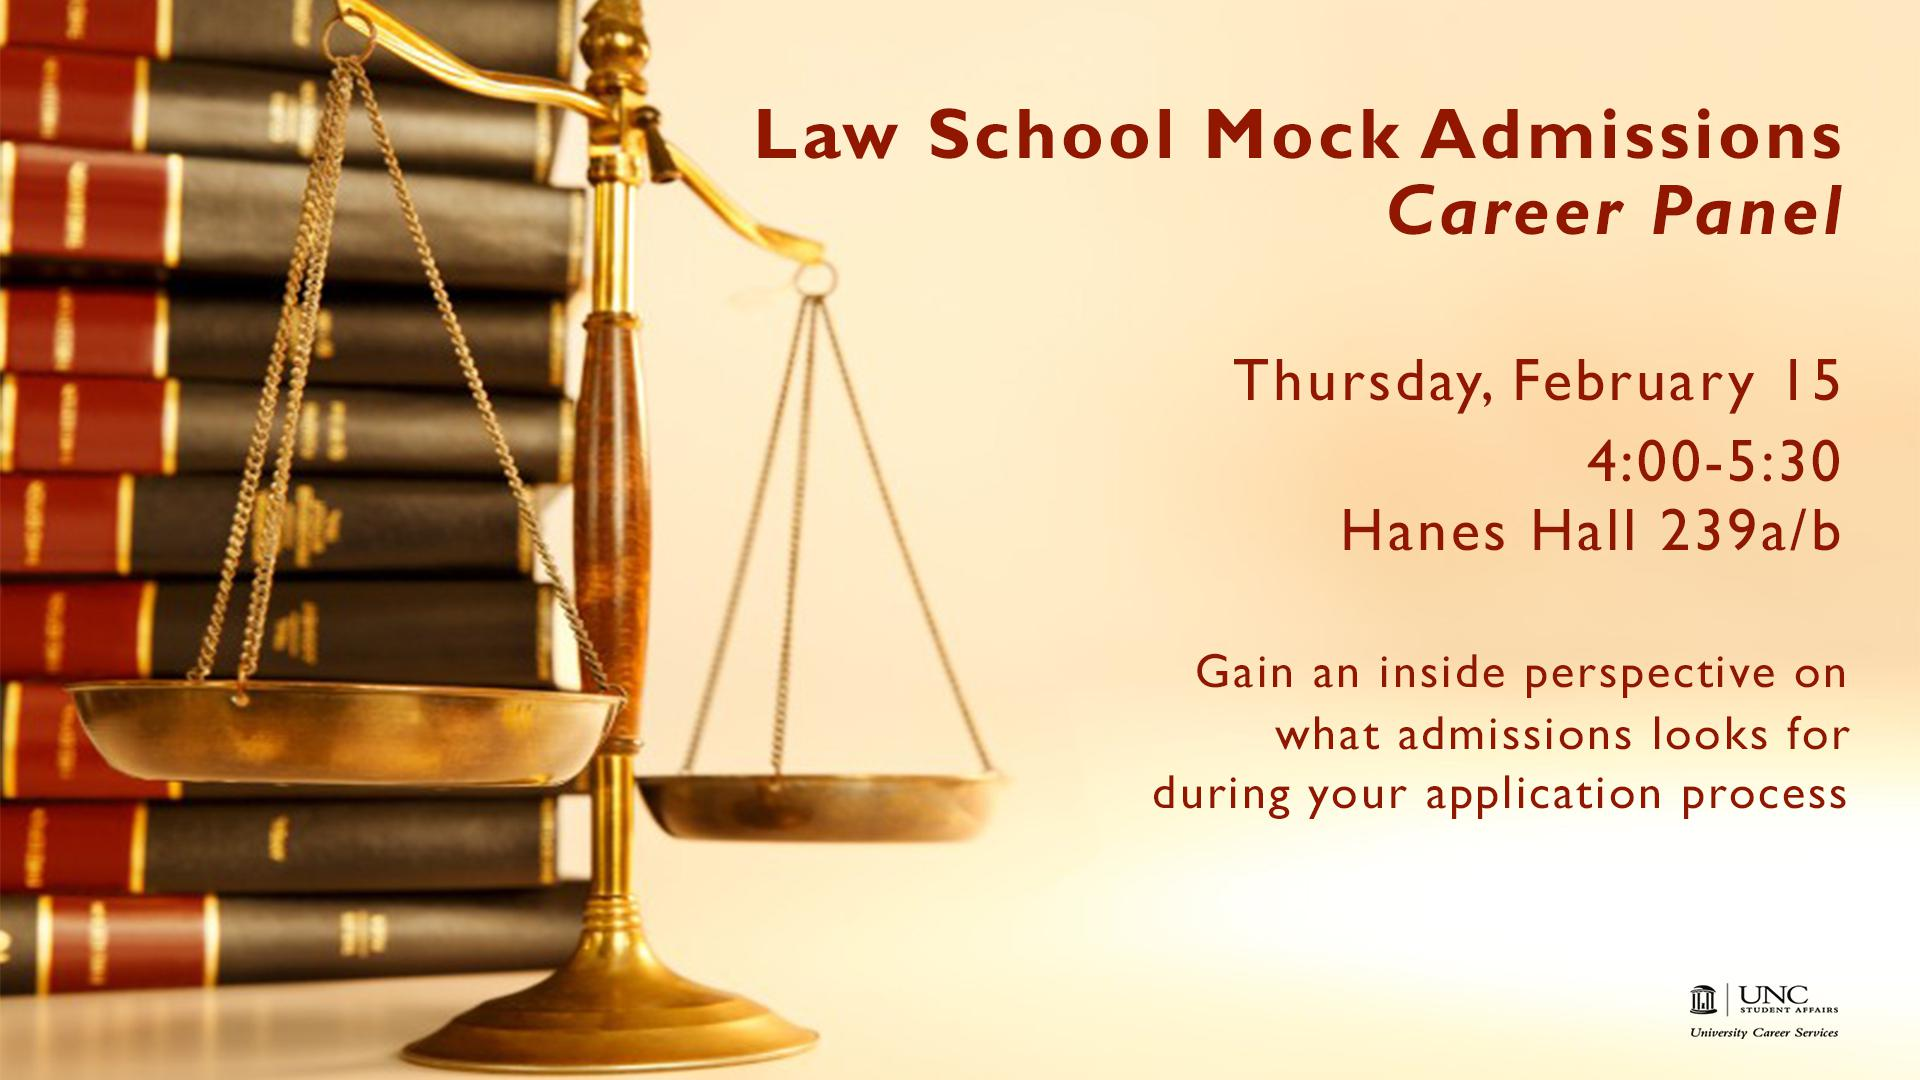 Law School Mock Admissions Panel